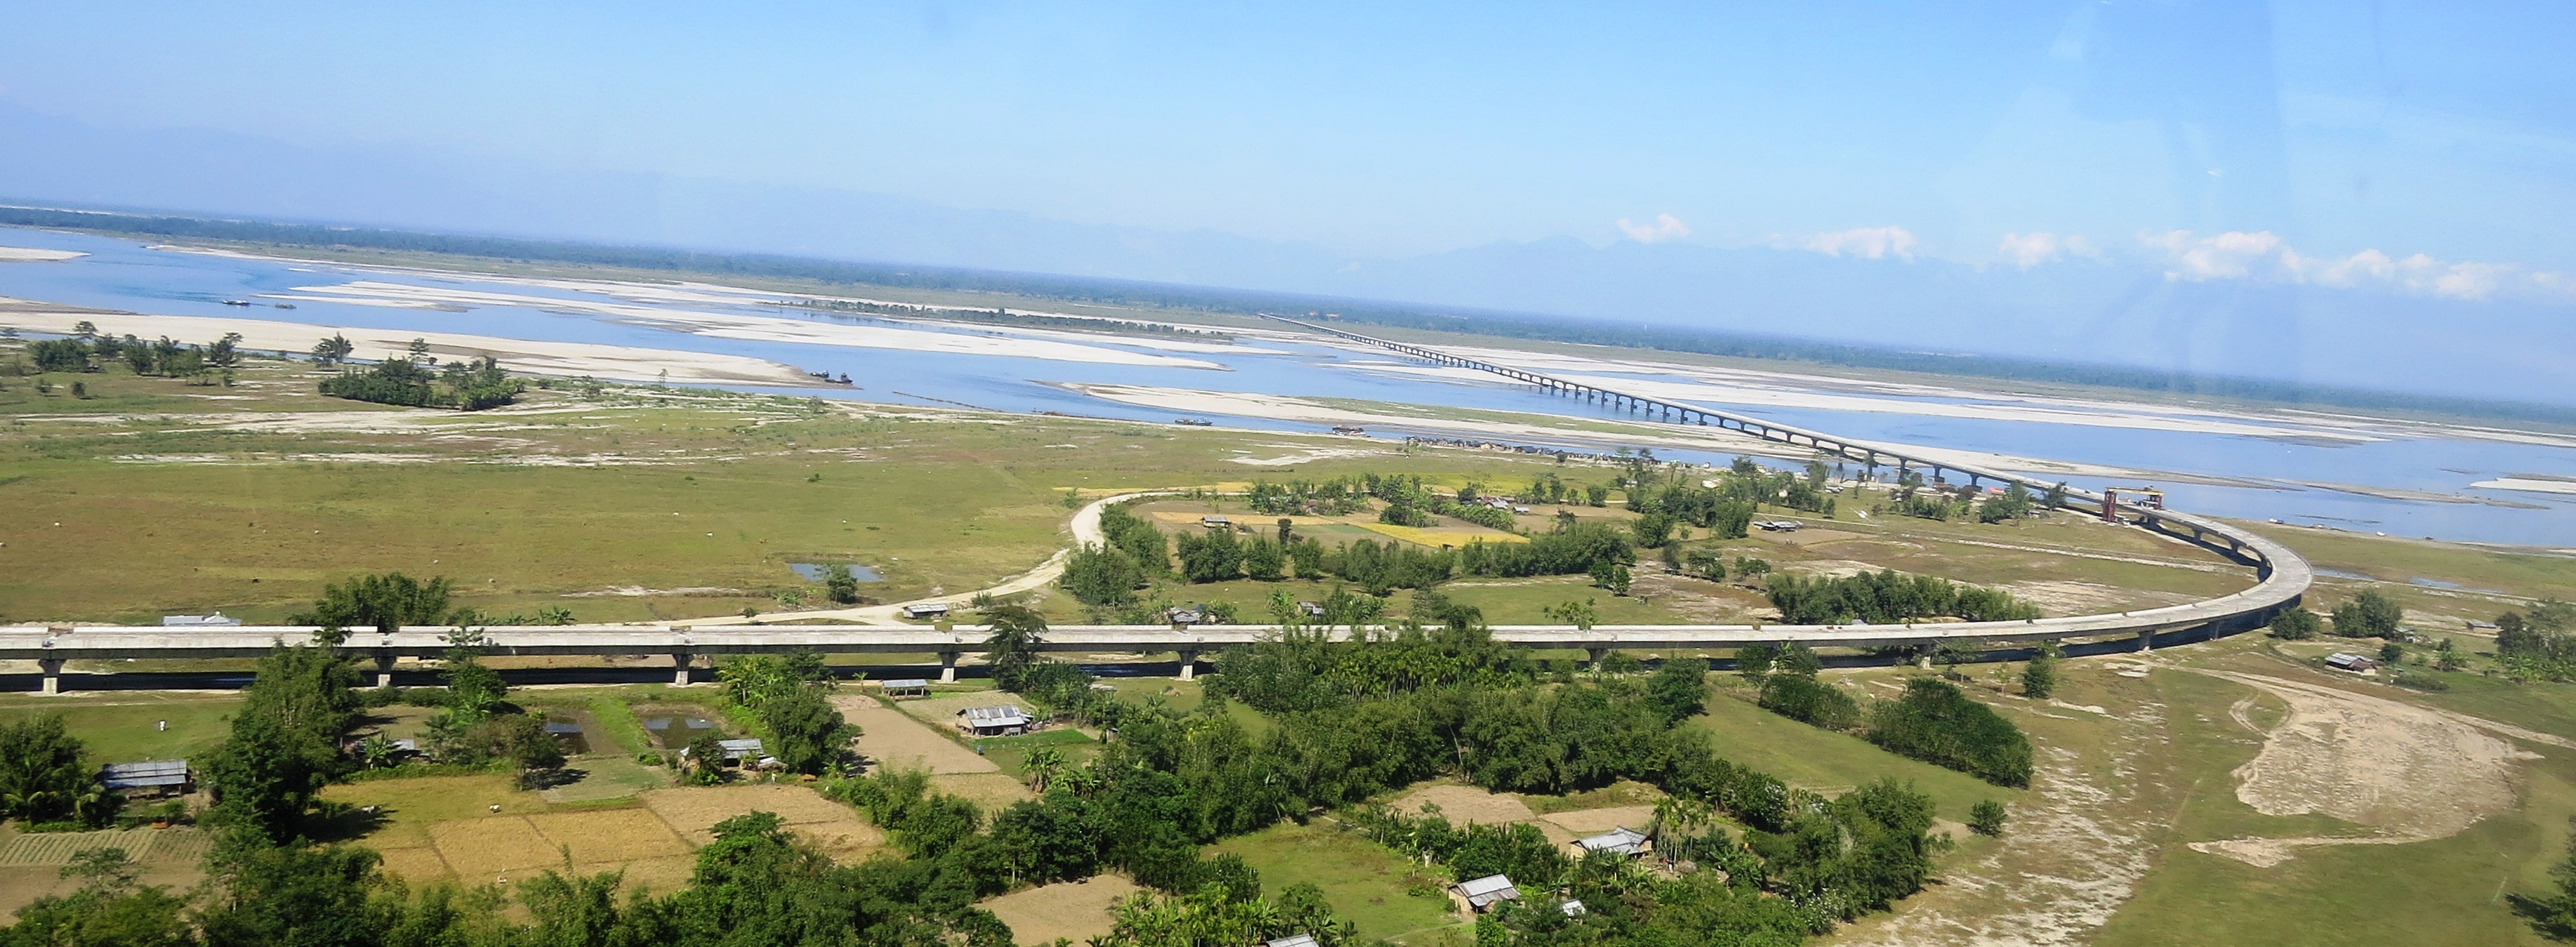 Dhola–Sadiya Bridge - Wikipedia